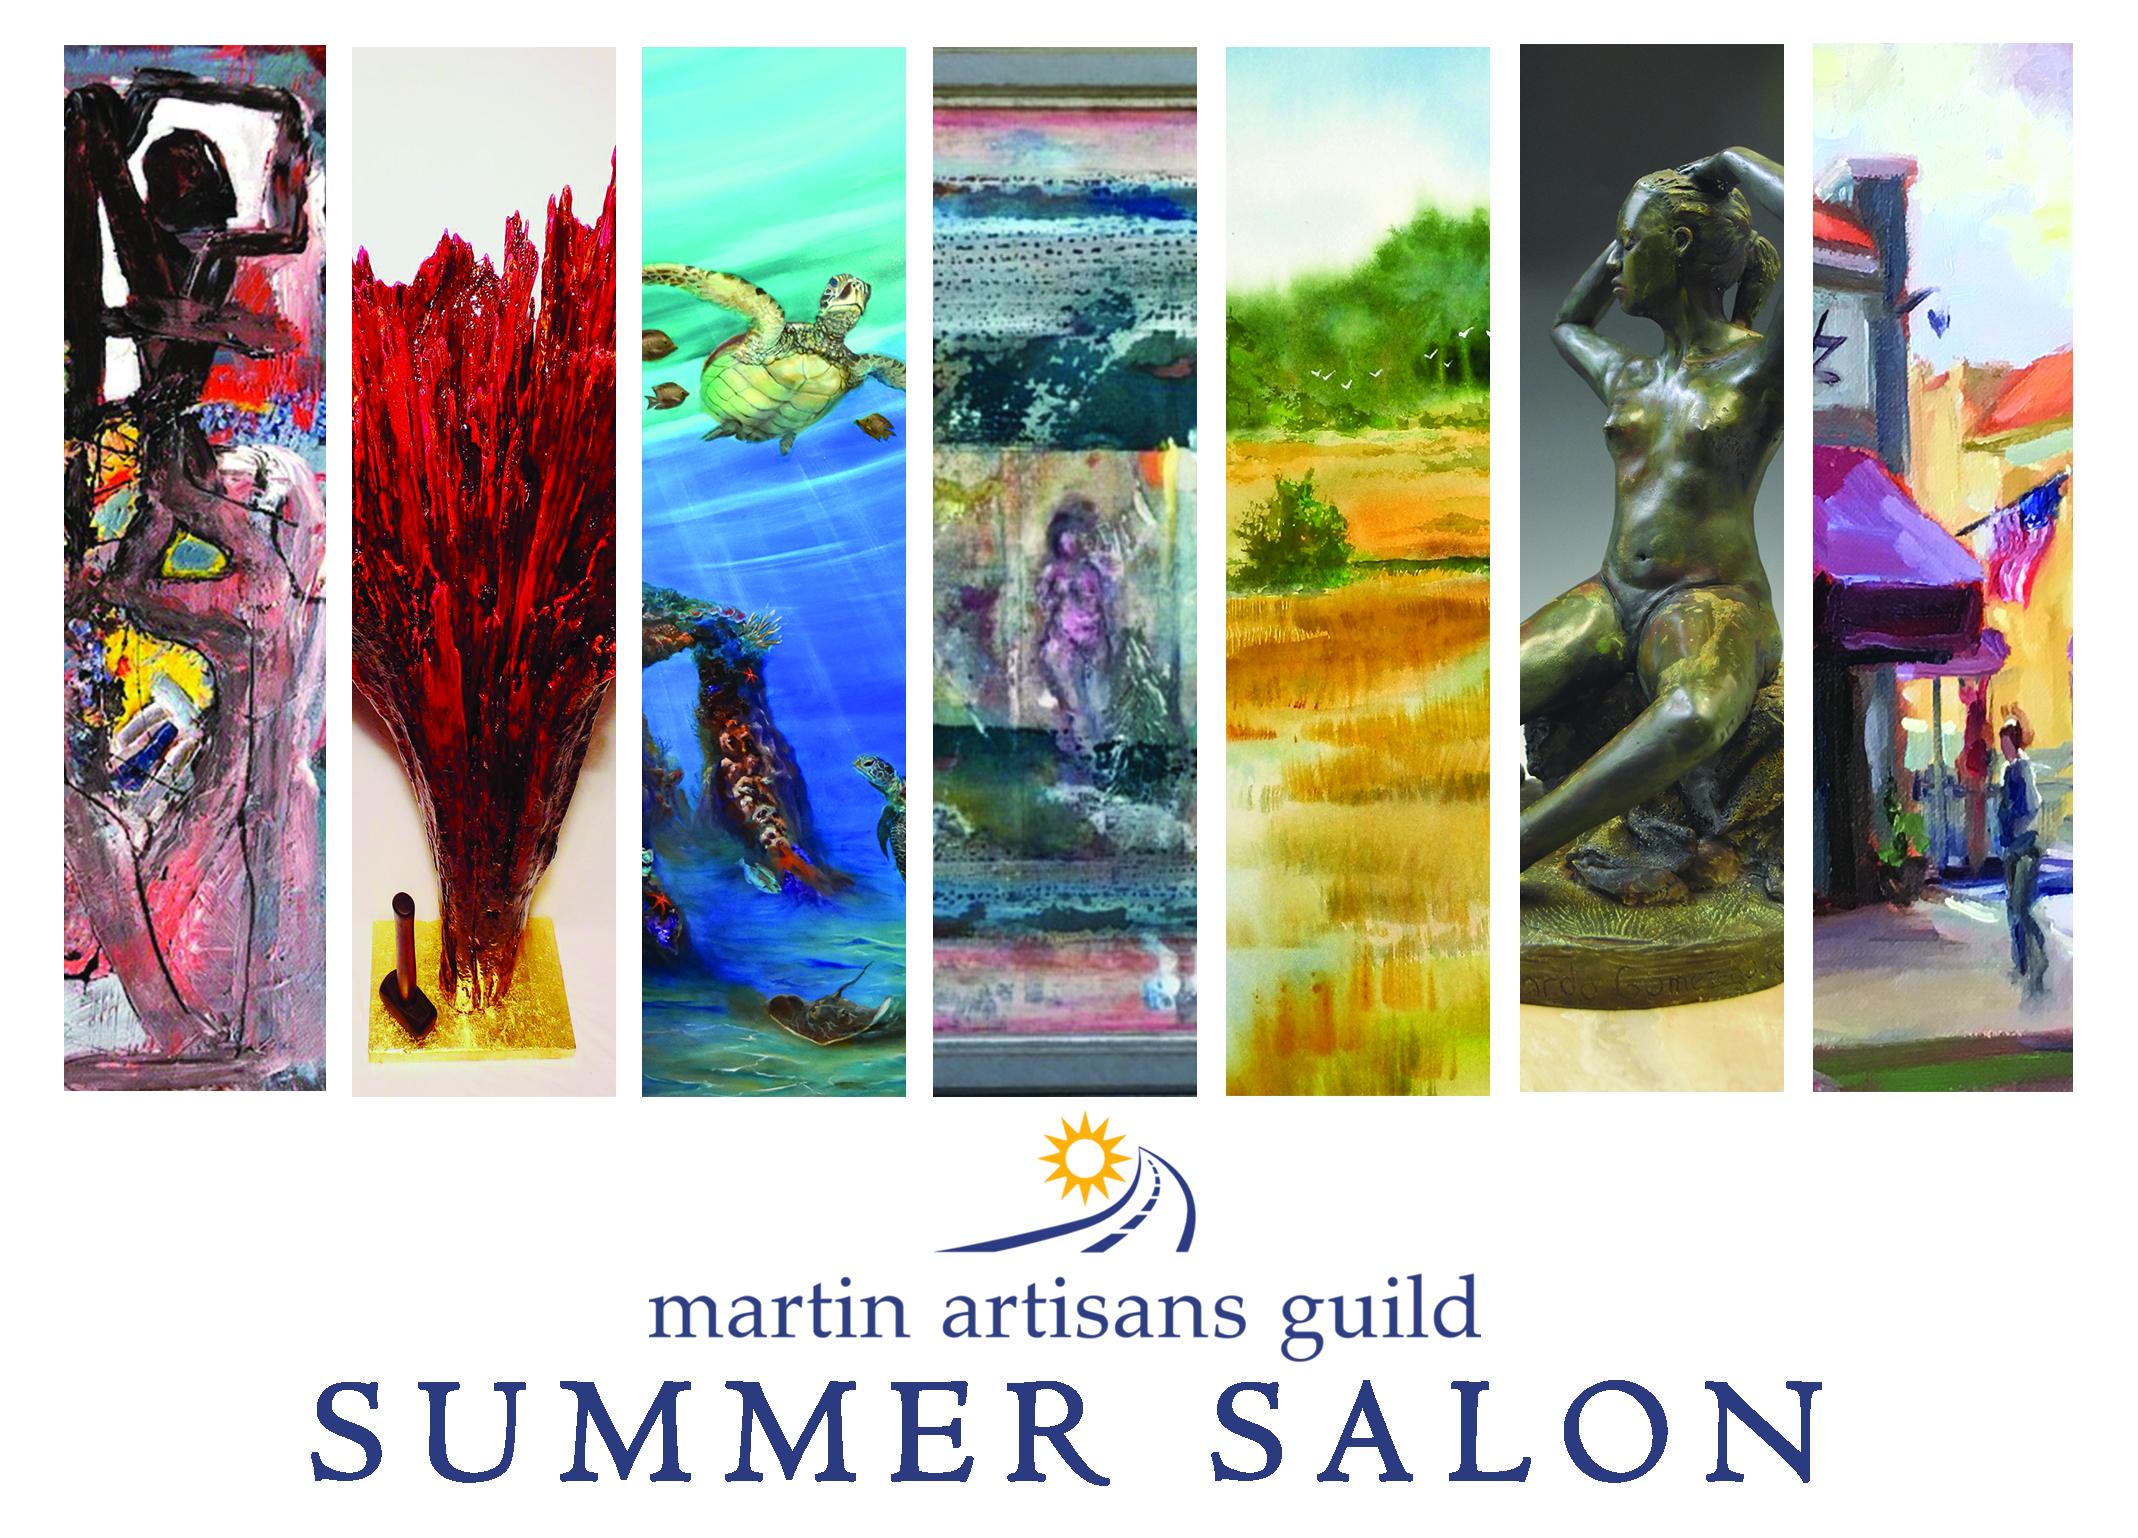 Martin Artisans Guild Summer Salon